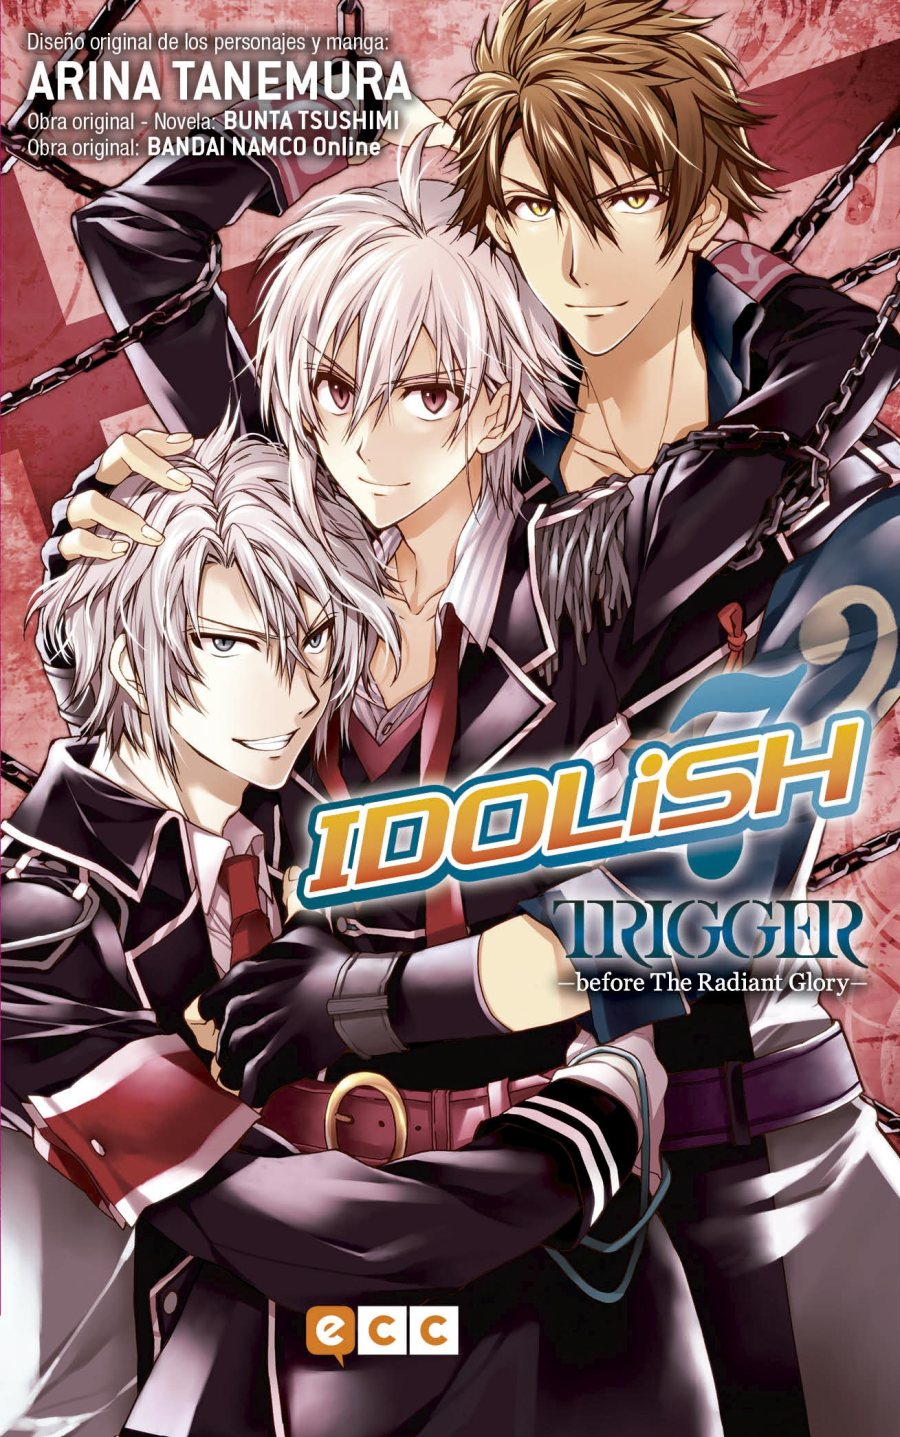 idolish_seven_trigger